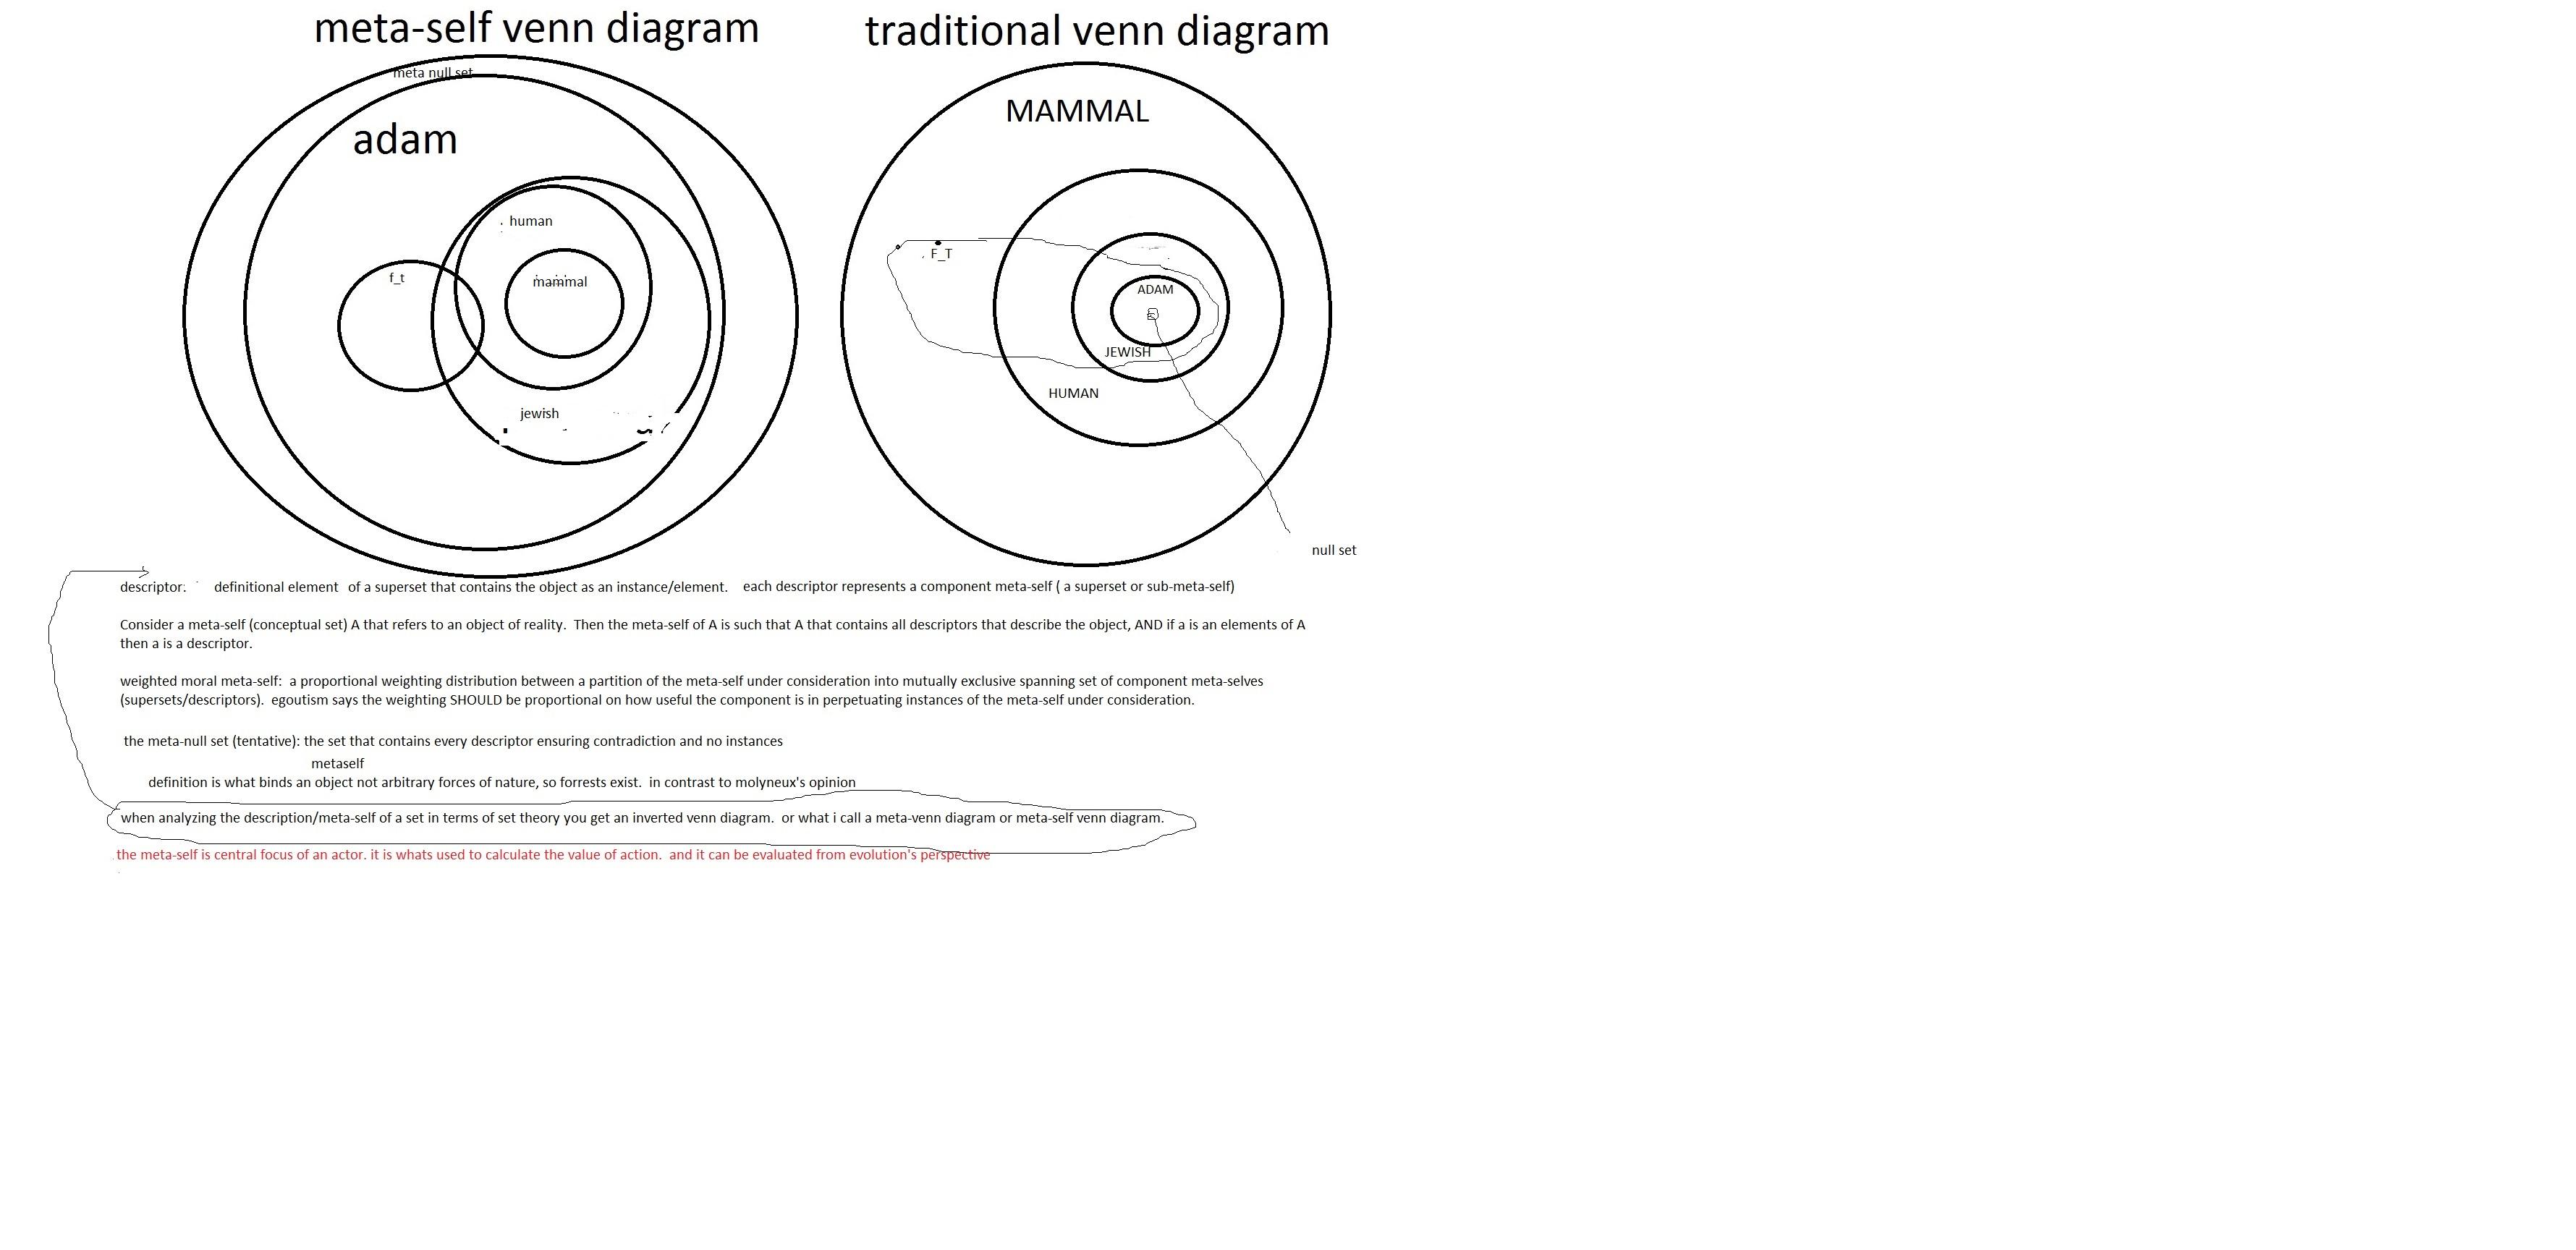 The Meta-Self: The Meta-Venn Diagram, a refined definition